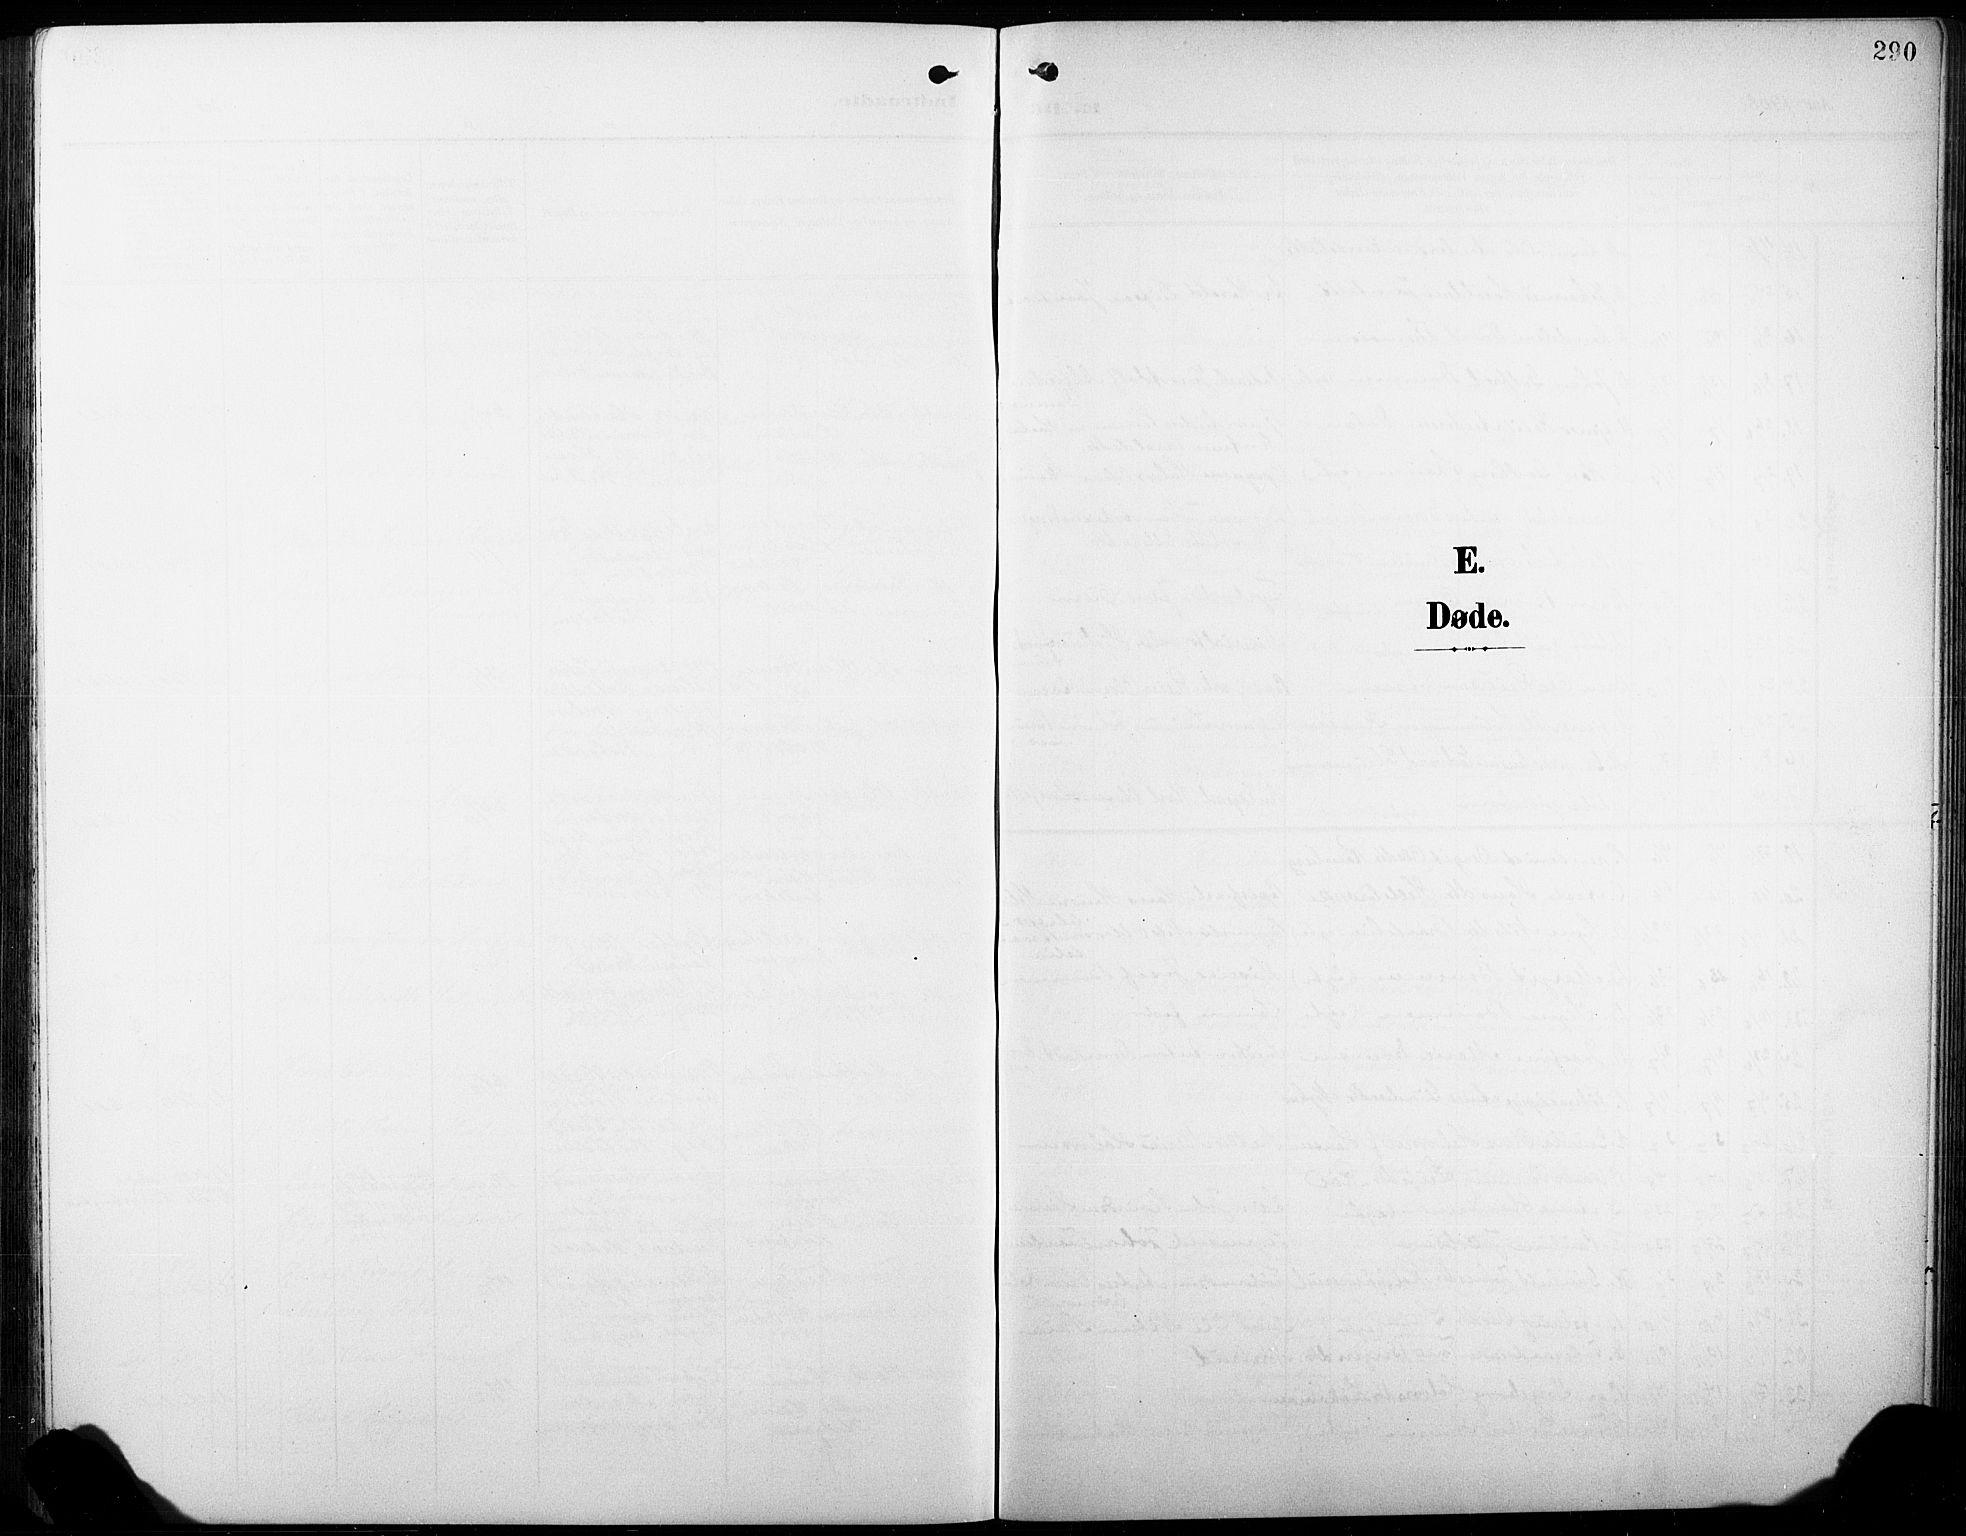 SAKO, Heddal kirkebøker, G/Ga/L0003: Klokkerbok nr. I 3, 1908-1932, s. 290